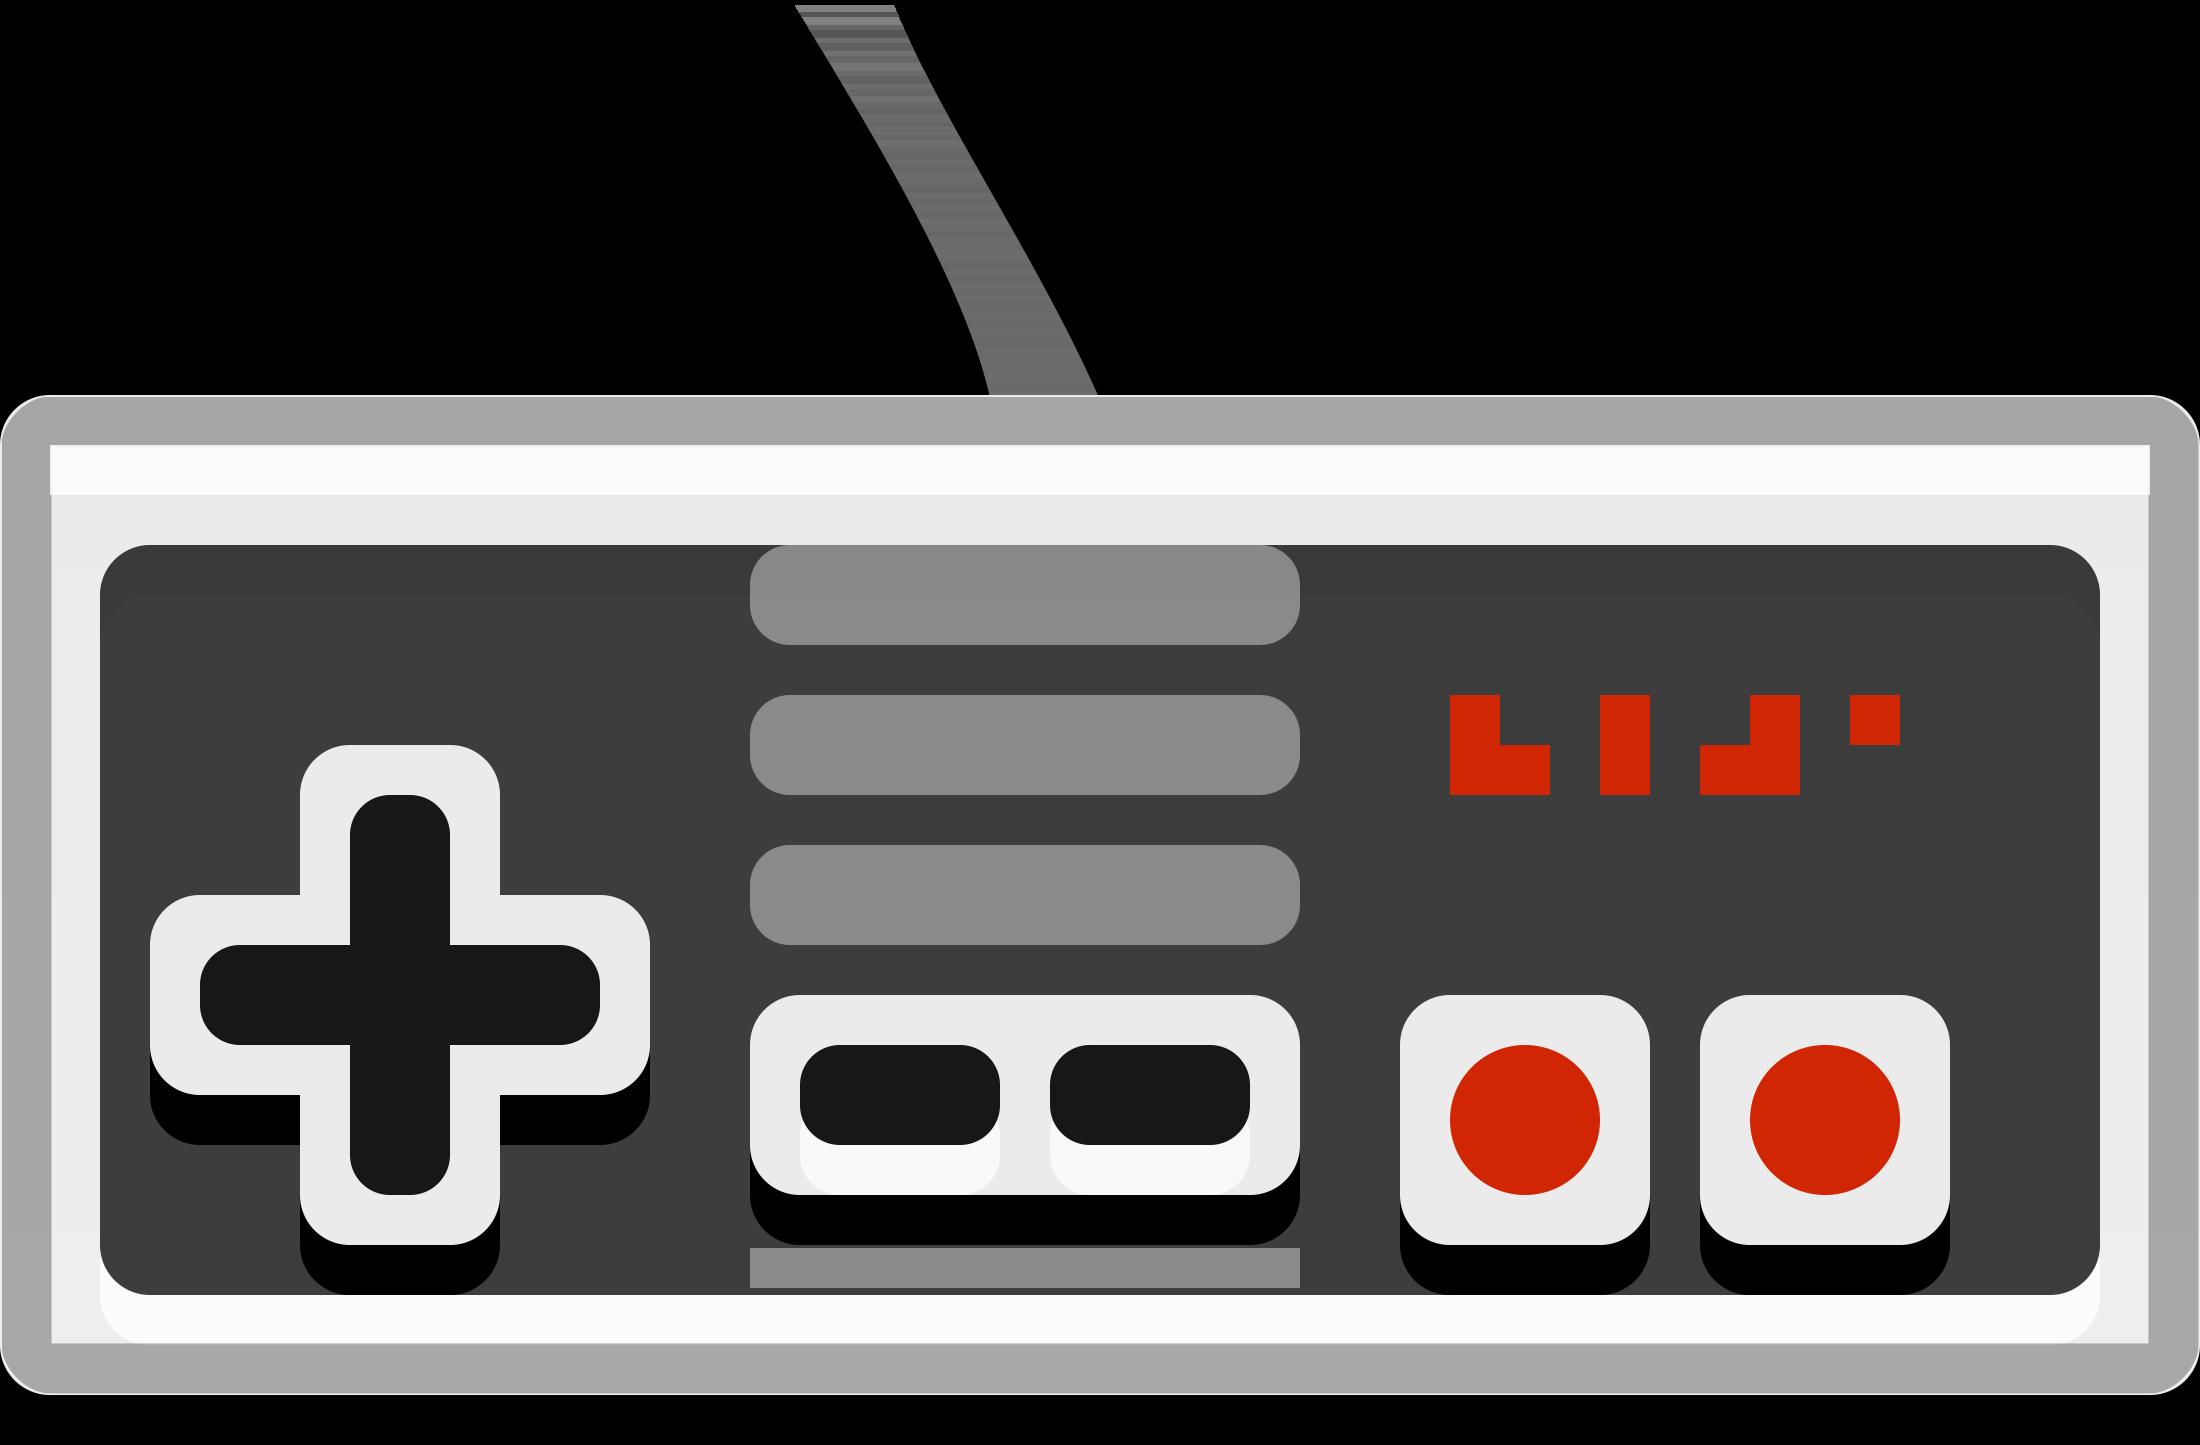 Resultado de imagen para video game controller